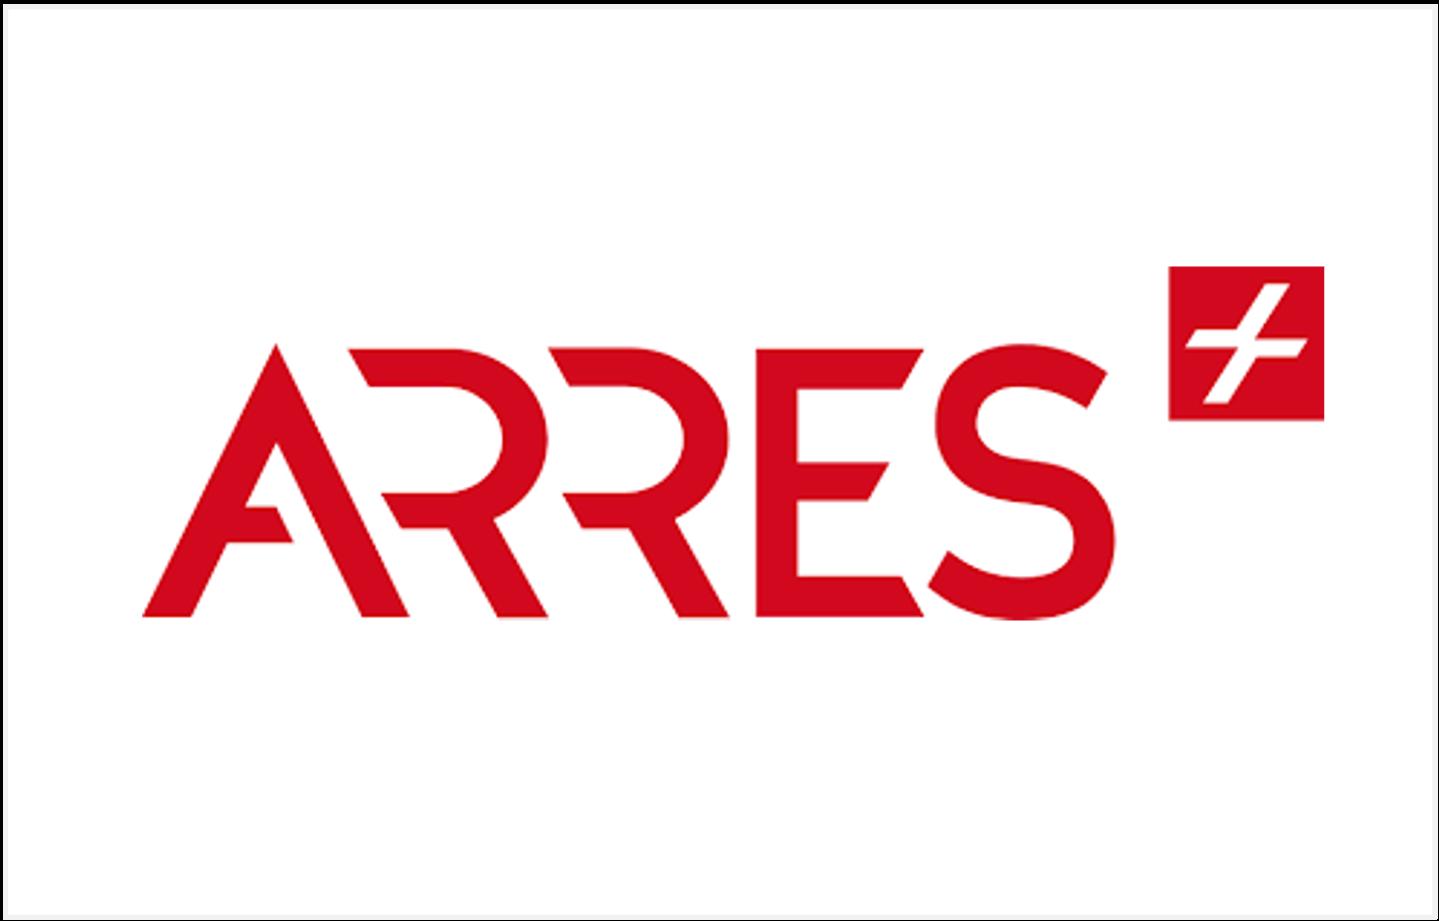 Solarmarkt GmbH - Arres